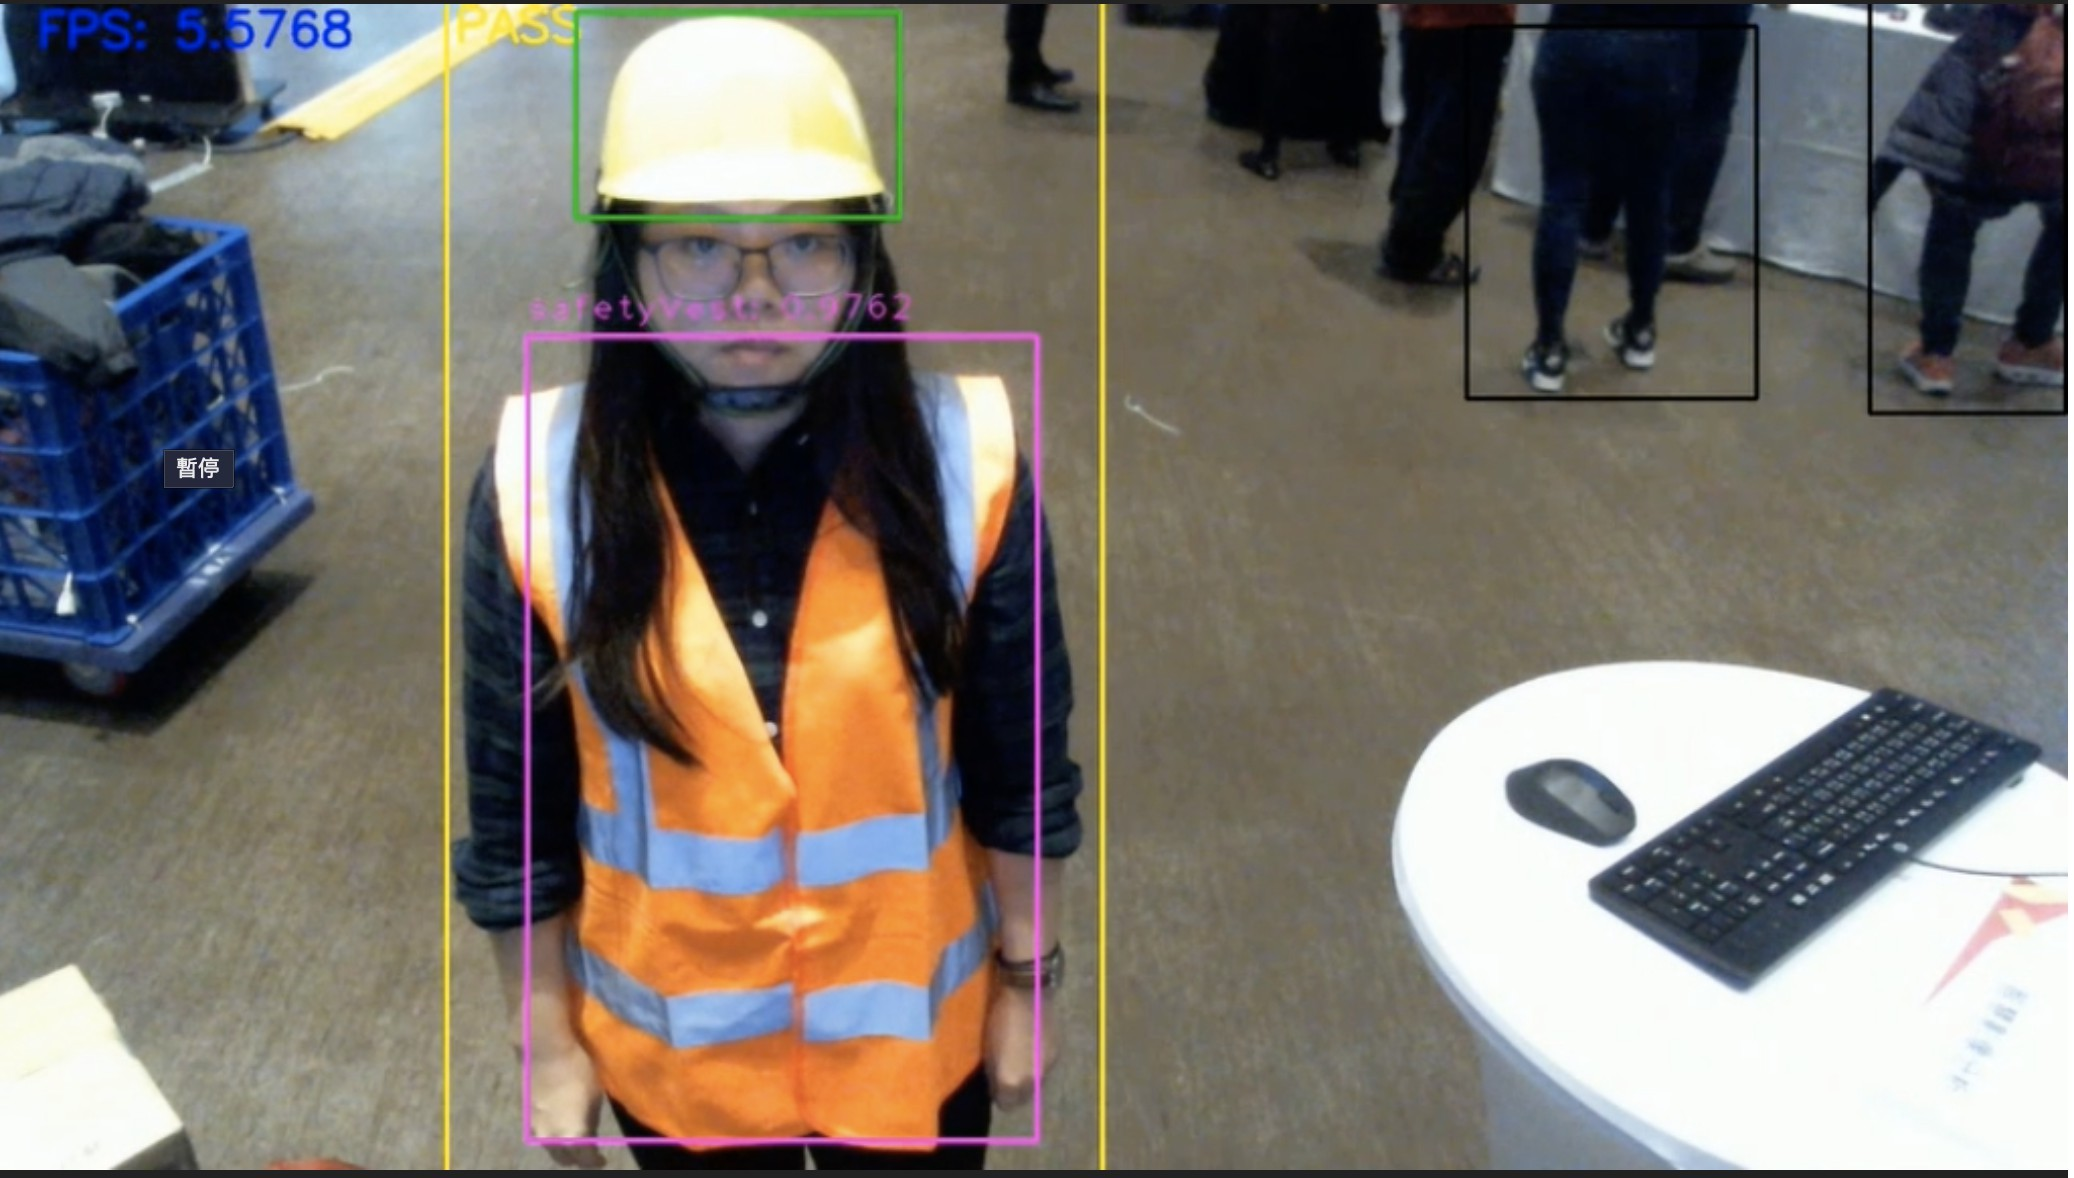 2020/12/11【AIoT的智慧未來】慧穩科技:用 AI 影像打造的「正循環」一條龍服務